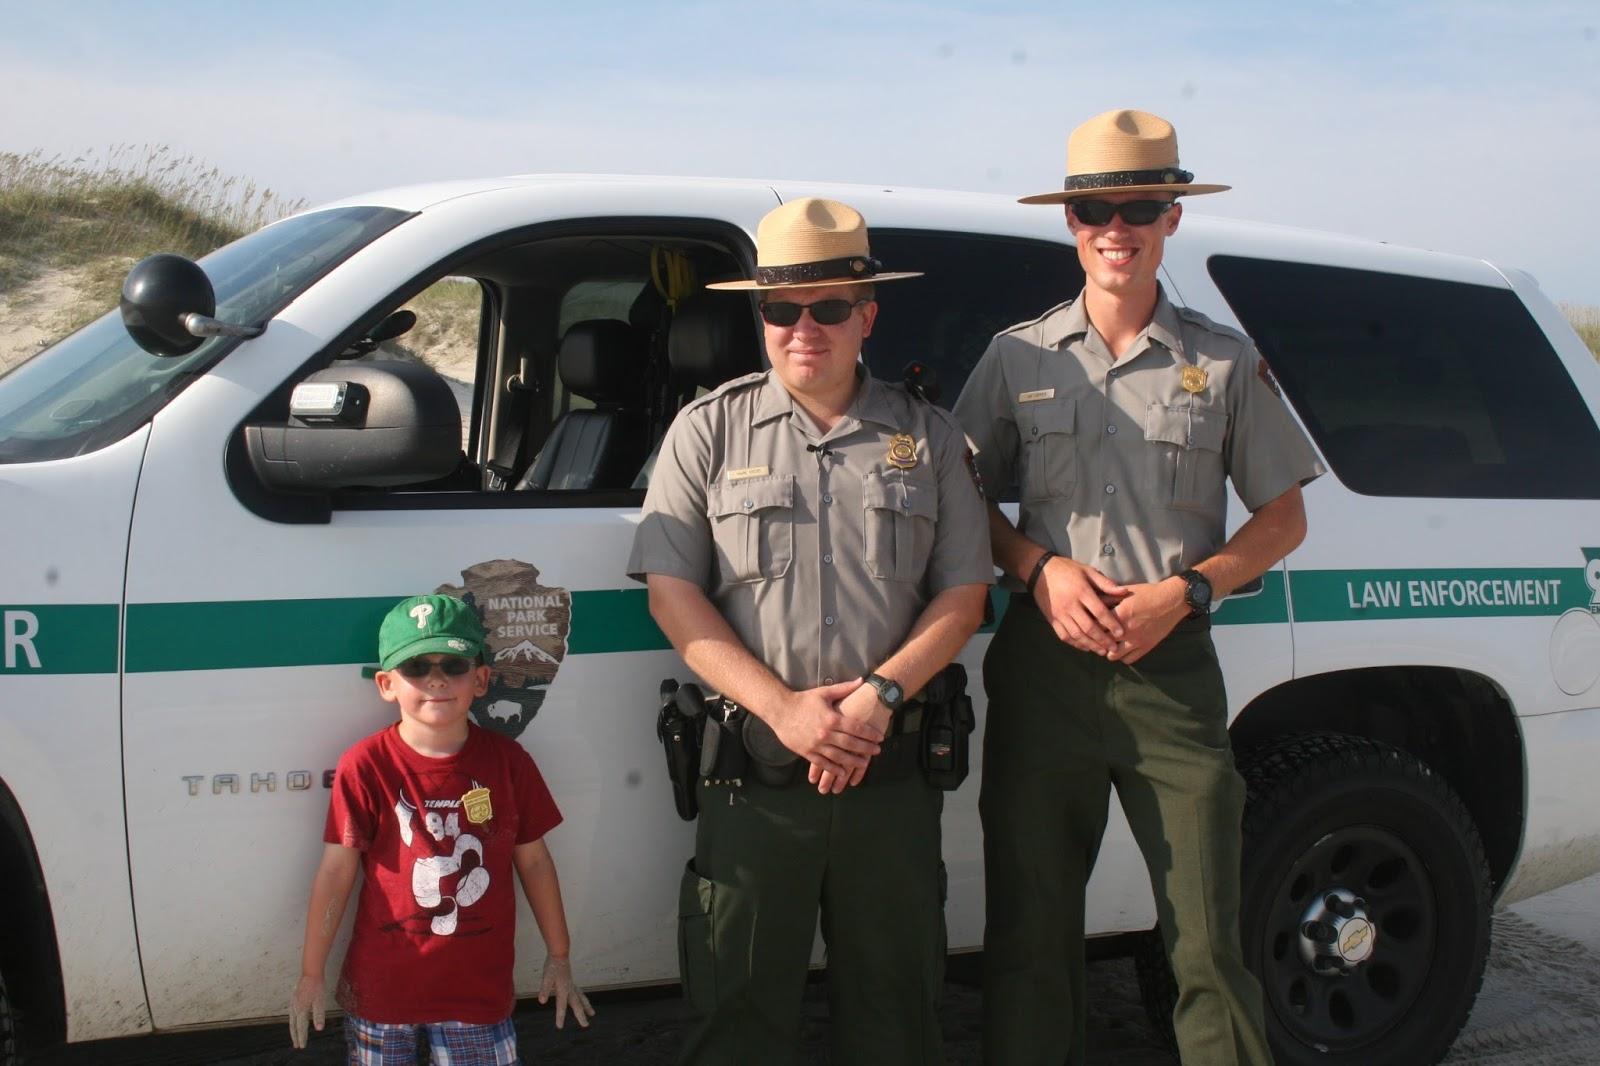 Fire Island National Seashore Park Rangers